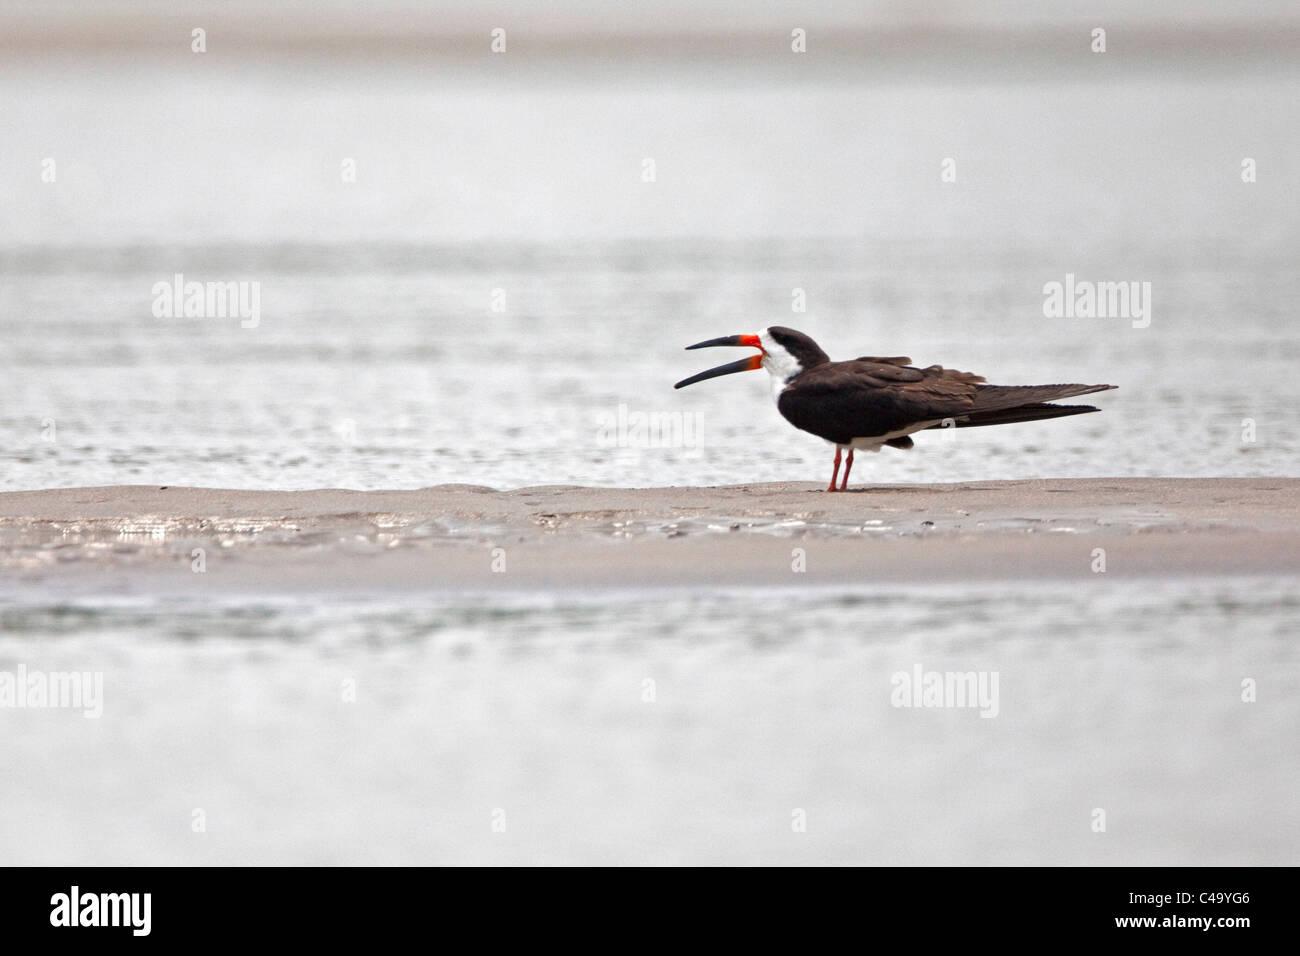 Manu National Park, Black Skimmer ( Rynchops niger ) in the Alto Madre de Dios River. - Stock Image